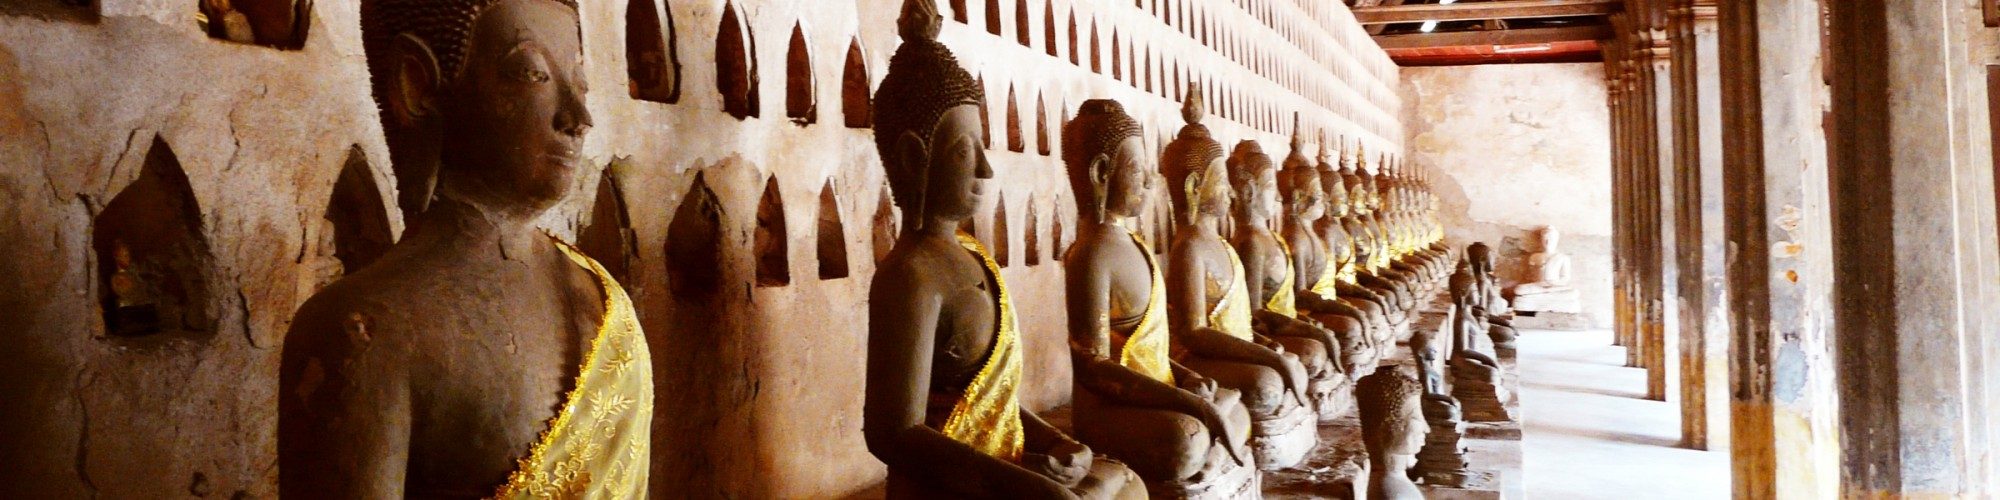 Vientiane - Wat Sisaket copy[1]